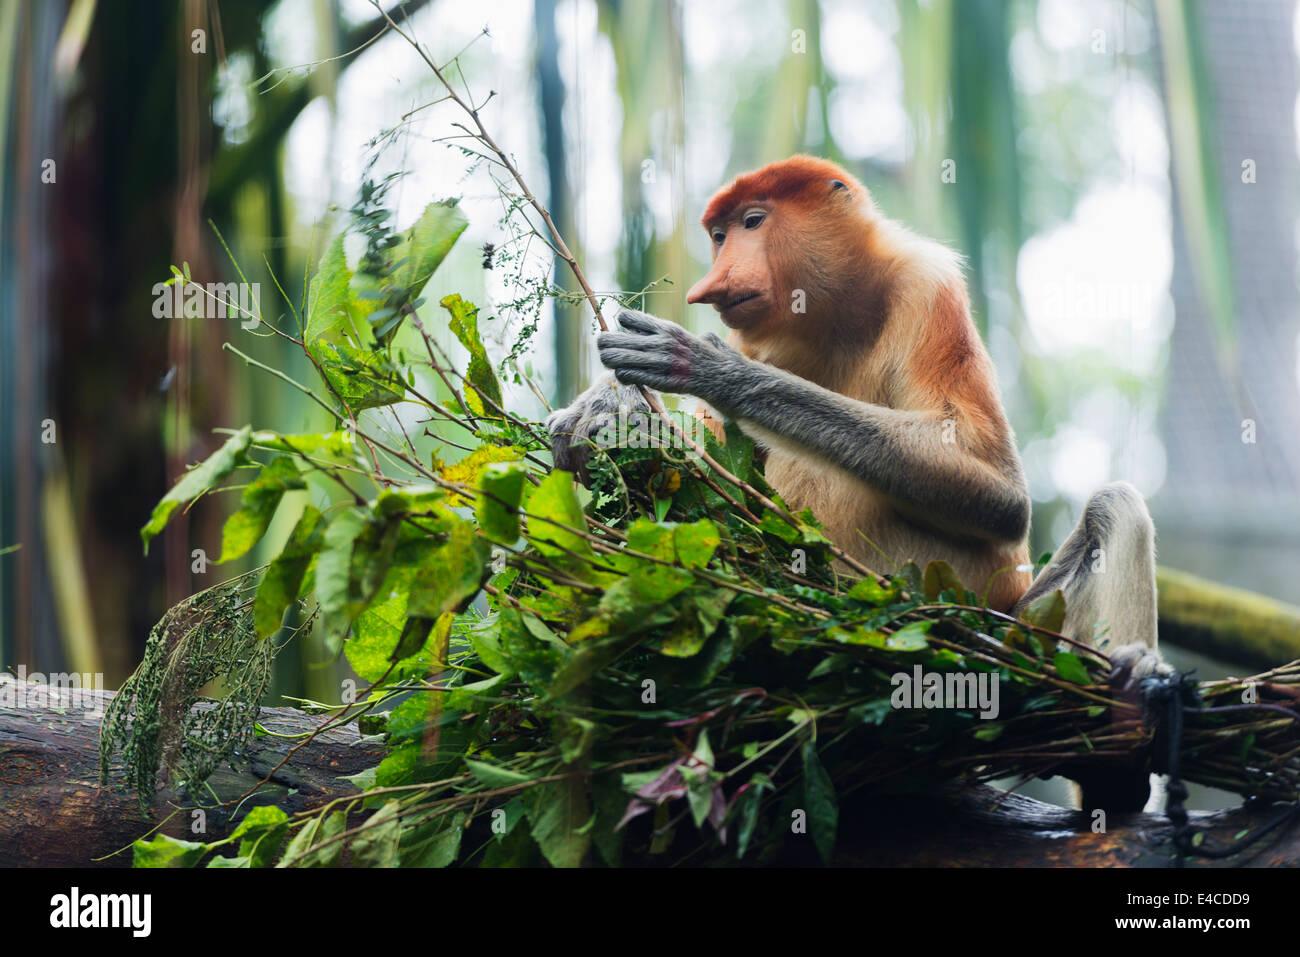 Sudeste asiático, Singapur, Singapur Zoo, Probóscide mono, Nasalis larvatus Imagen De Stock